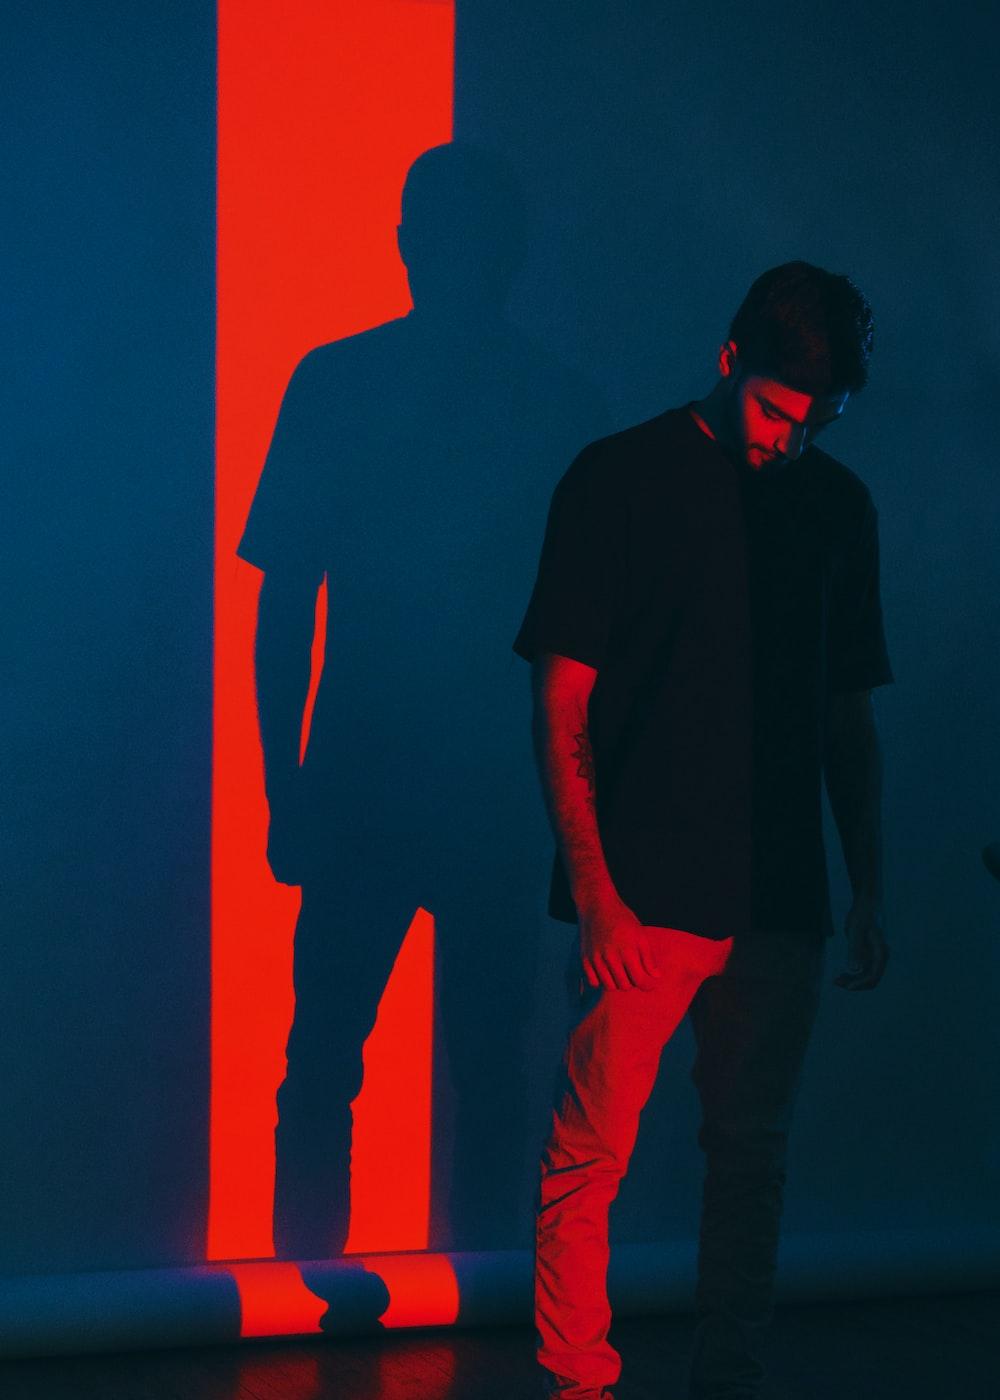 man wearing black shirt standing near wall